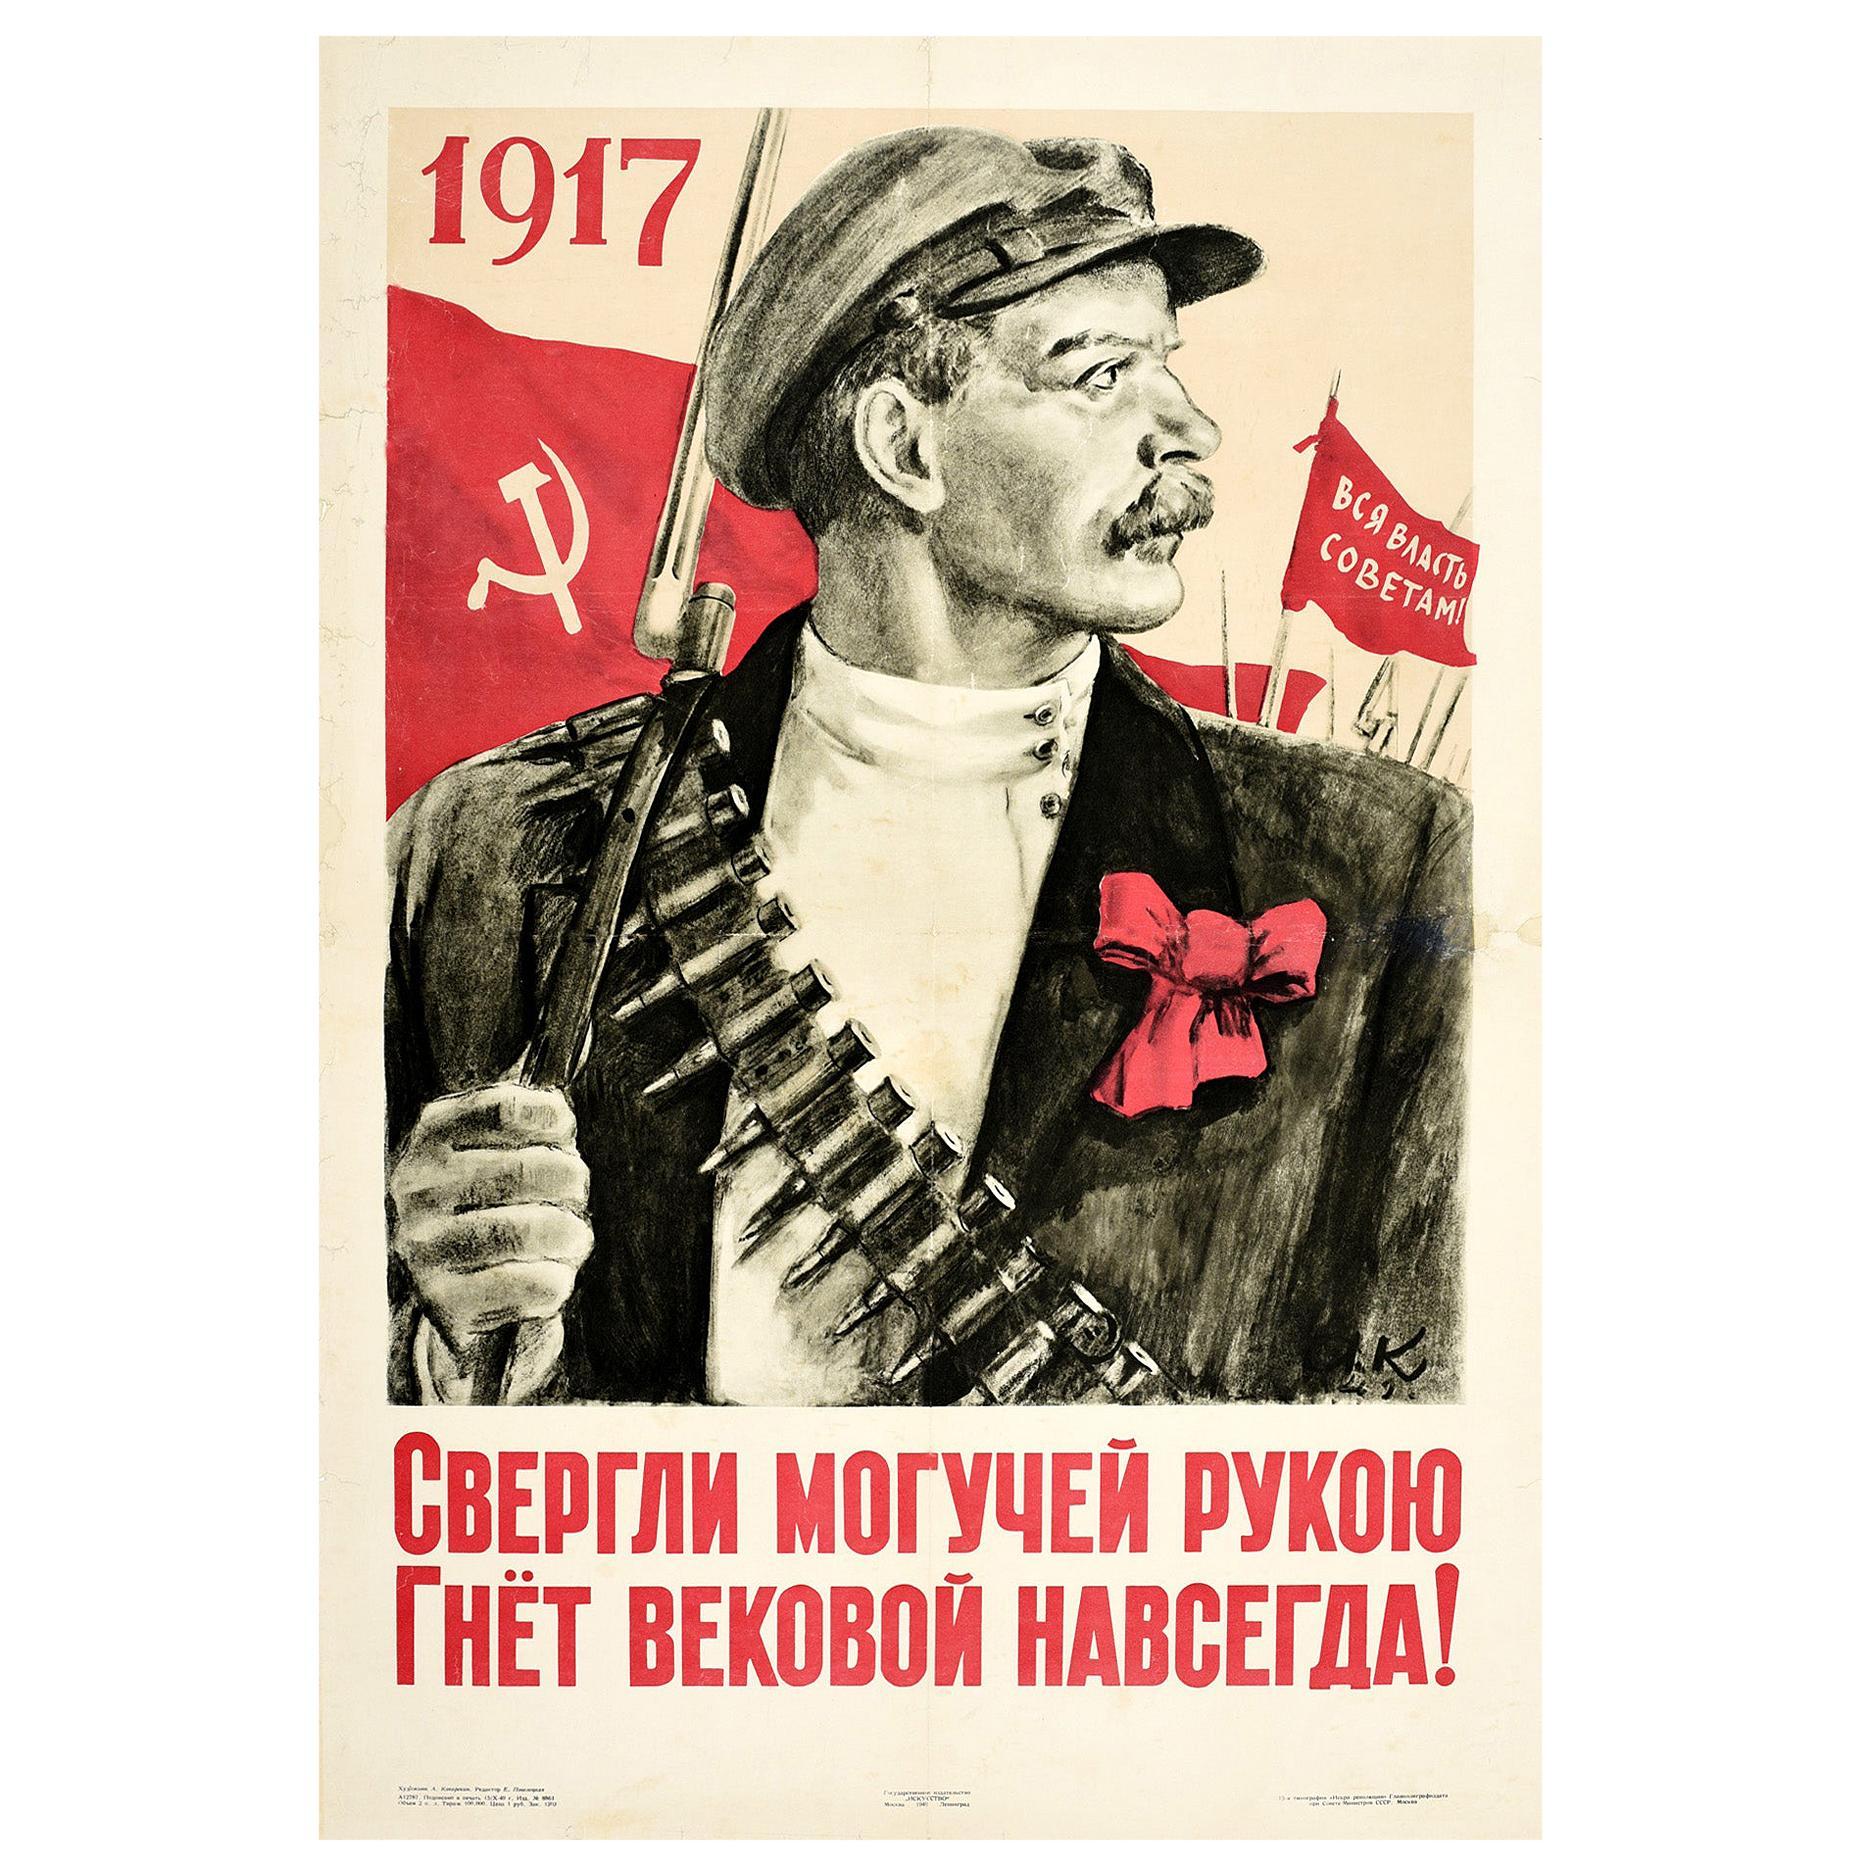 Original Vintage Communist Revolution Propaganda Poster All Power To The Soviets